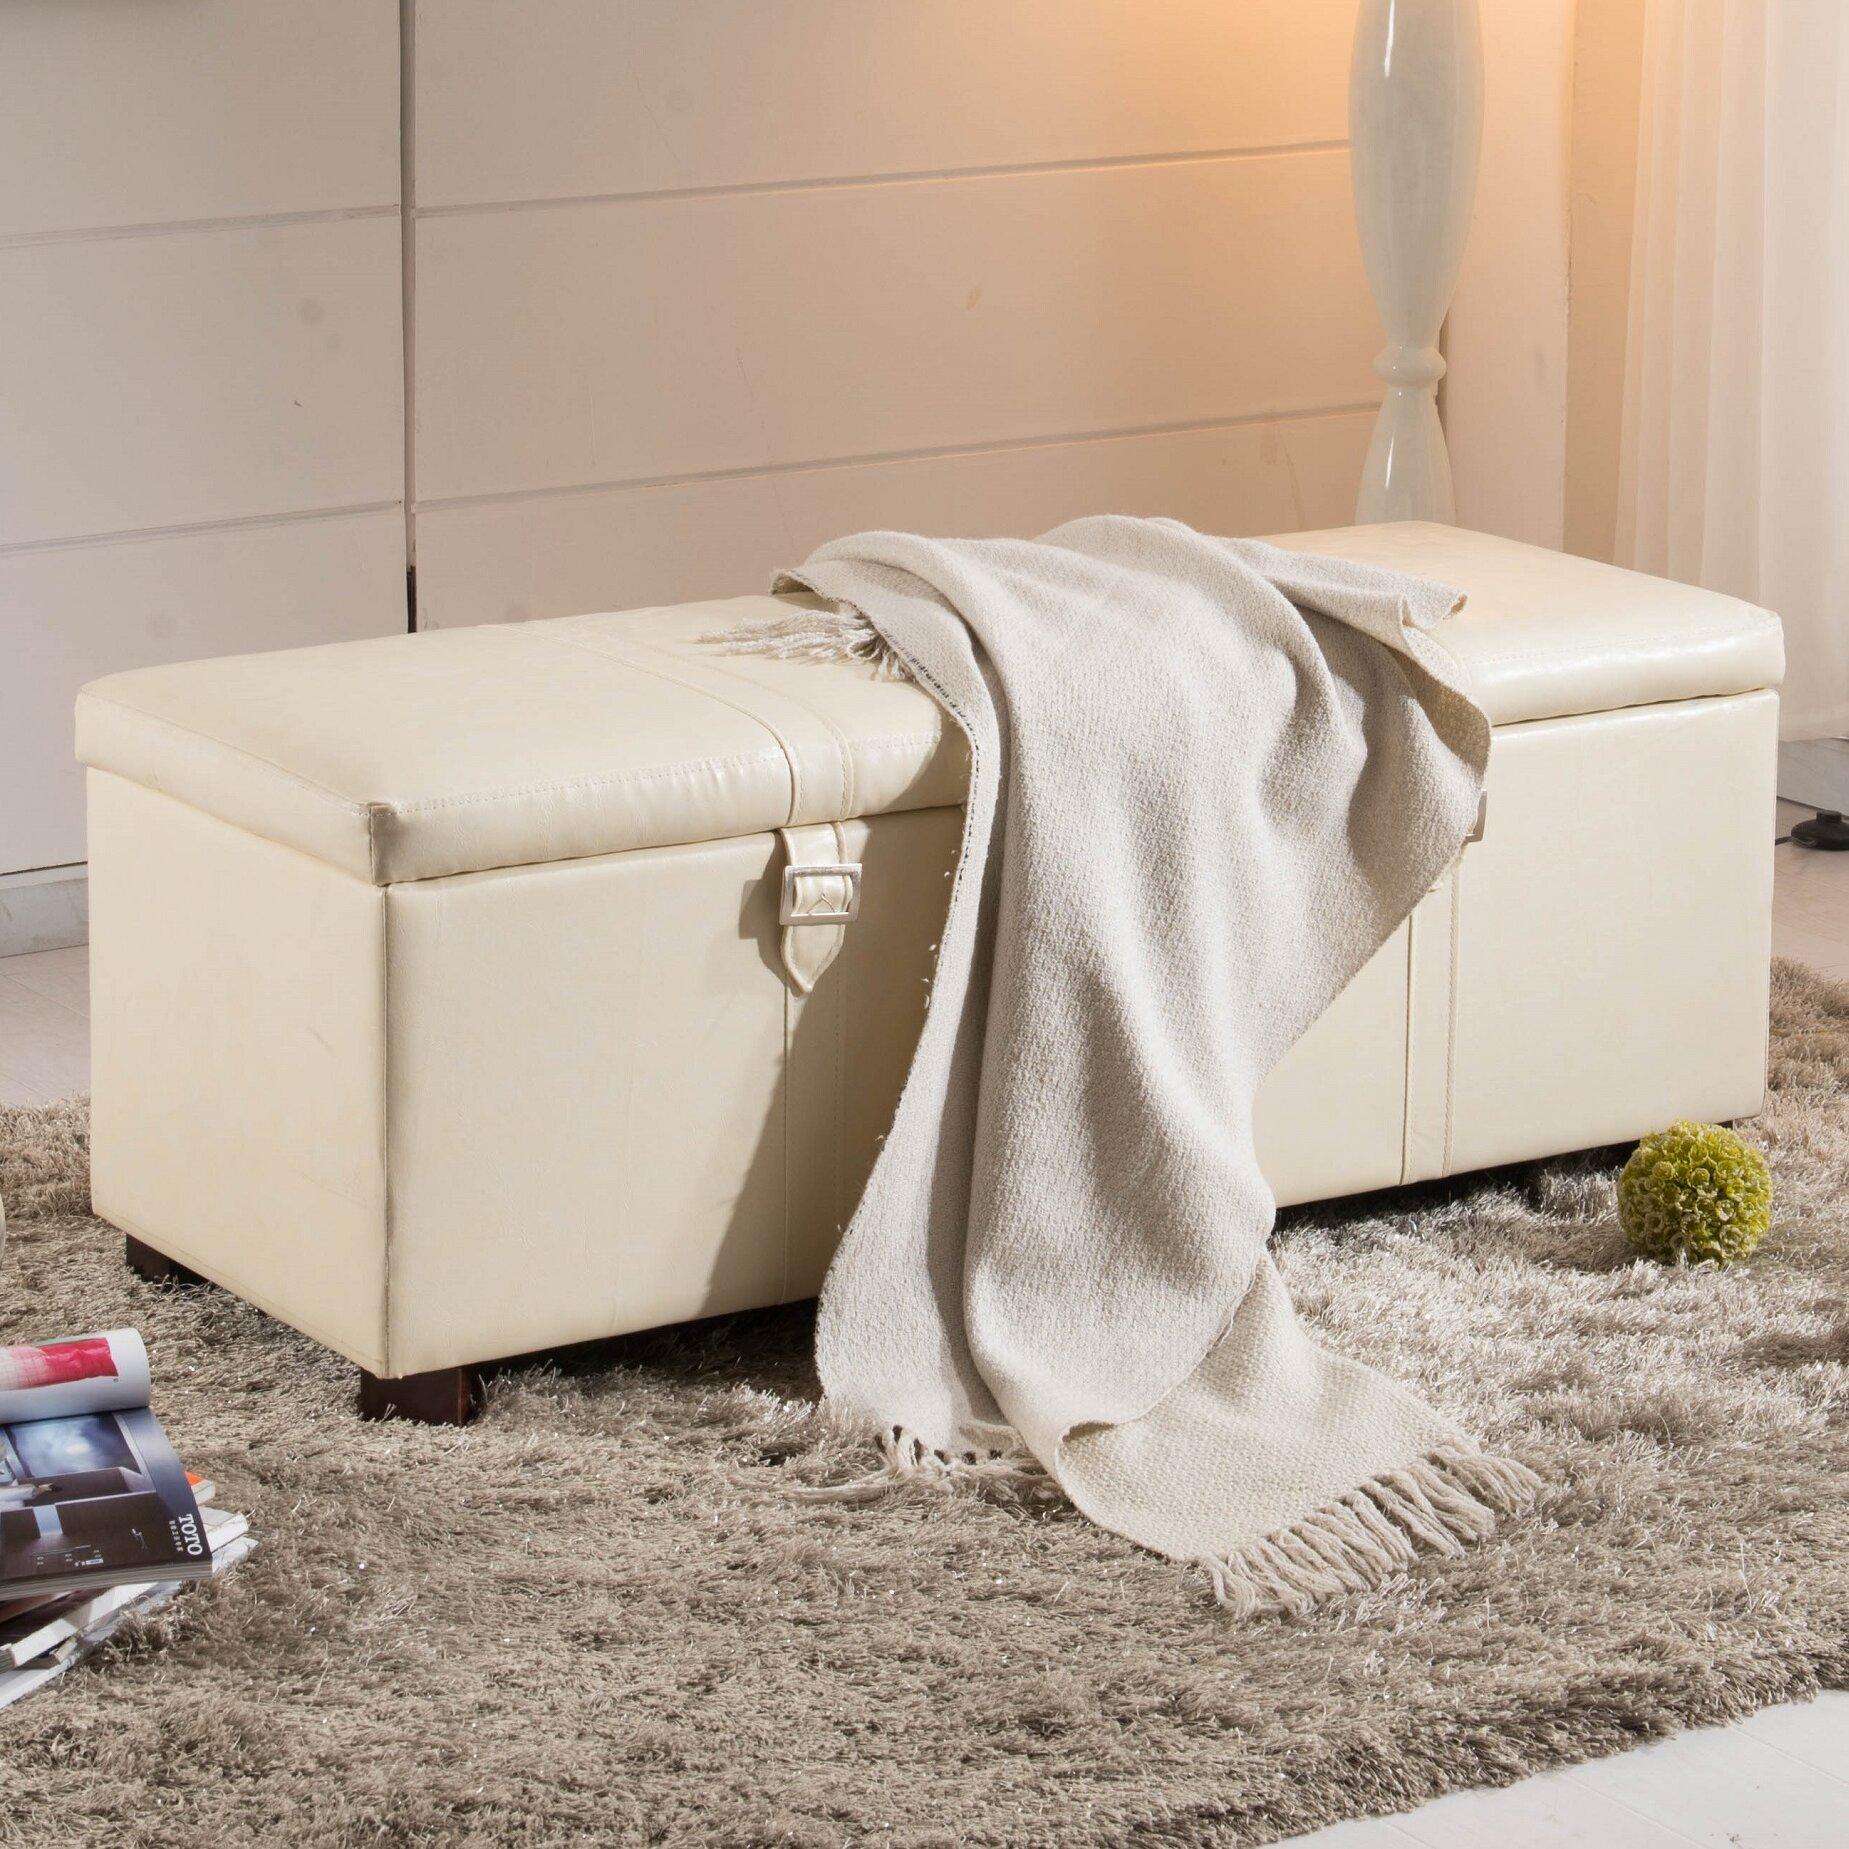 Noya Usa Castilian Upholstered Storage Bedroom Bench: NOYA USA Castillian Upholstered Storage Bench & Reviews